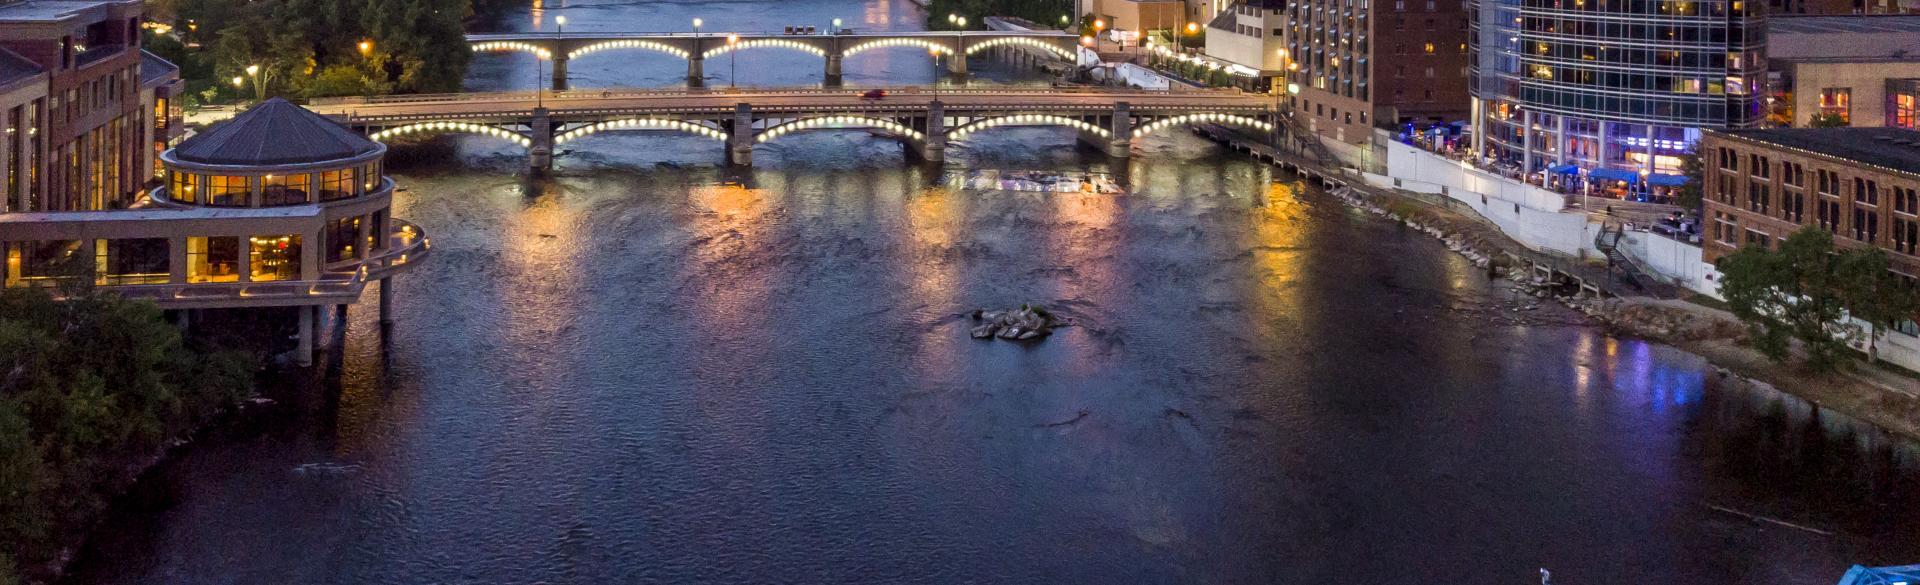 Brian Kelly - Nighttime Skyline Photo